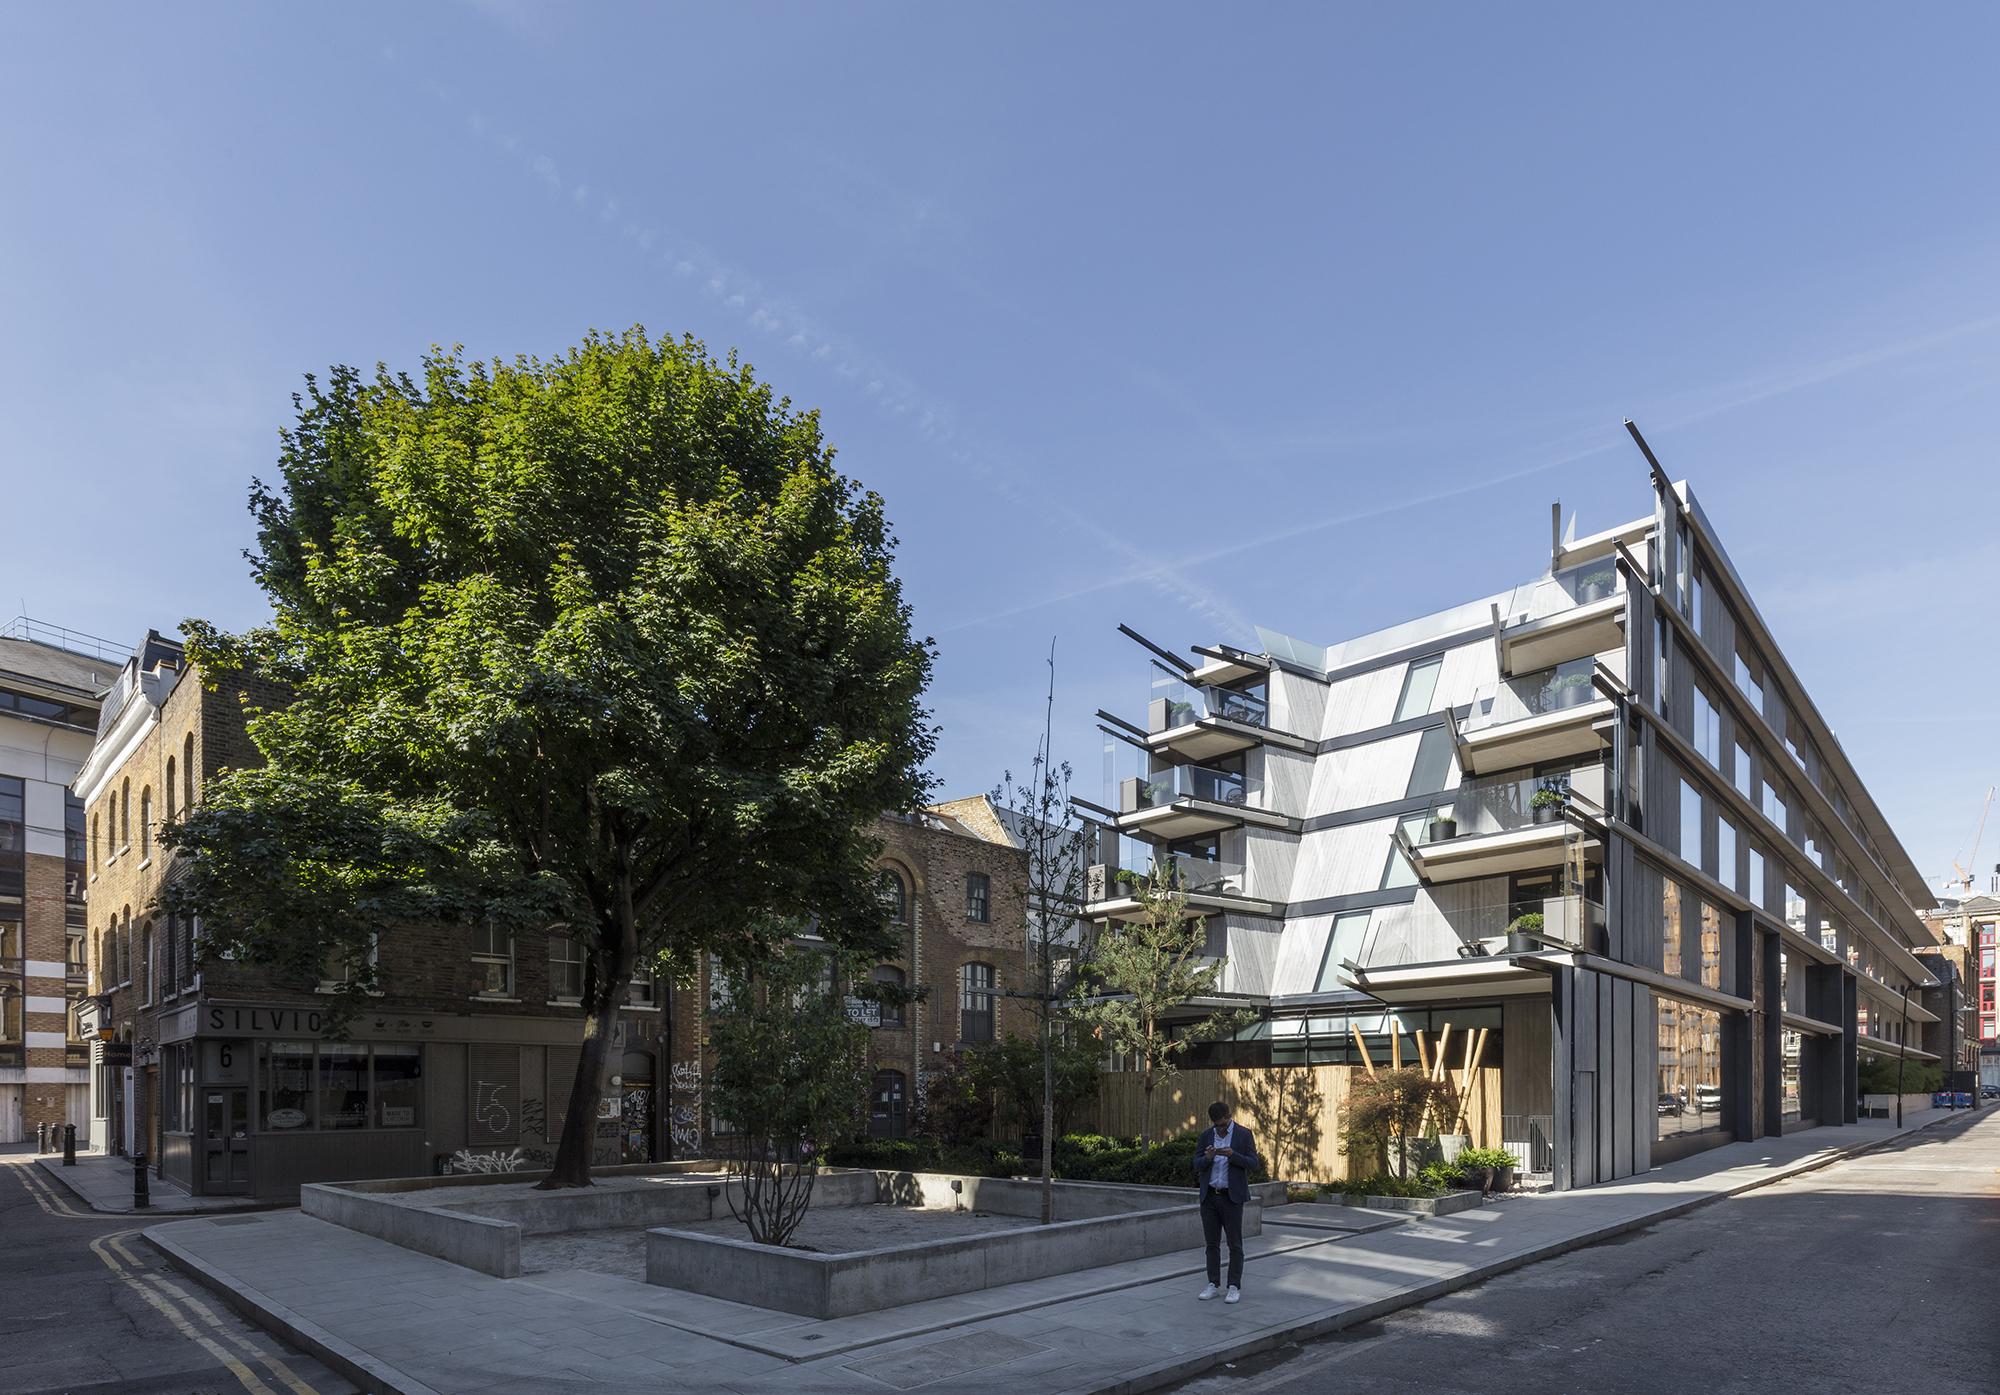 Hotel Nobu Shoreditch / Ben Adams Architects